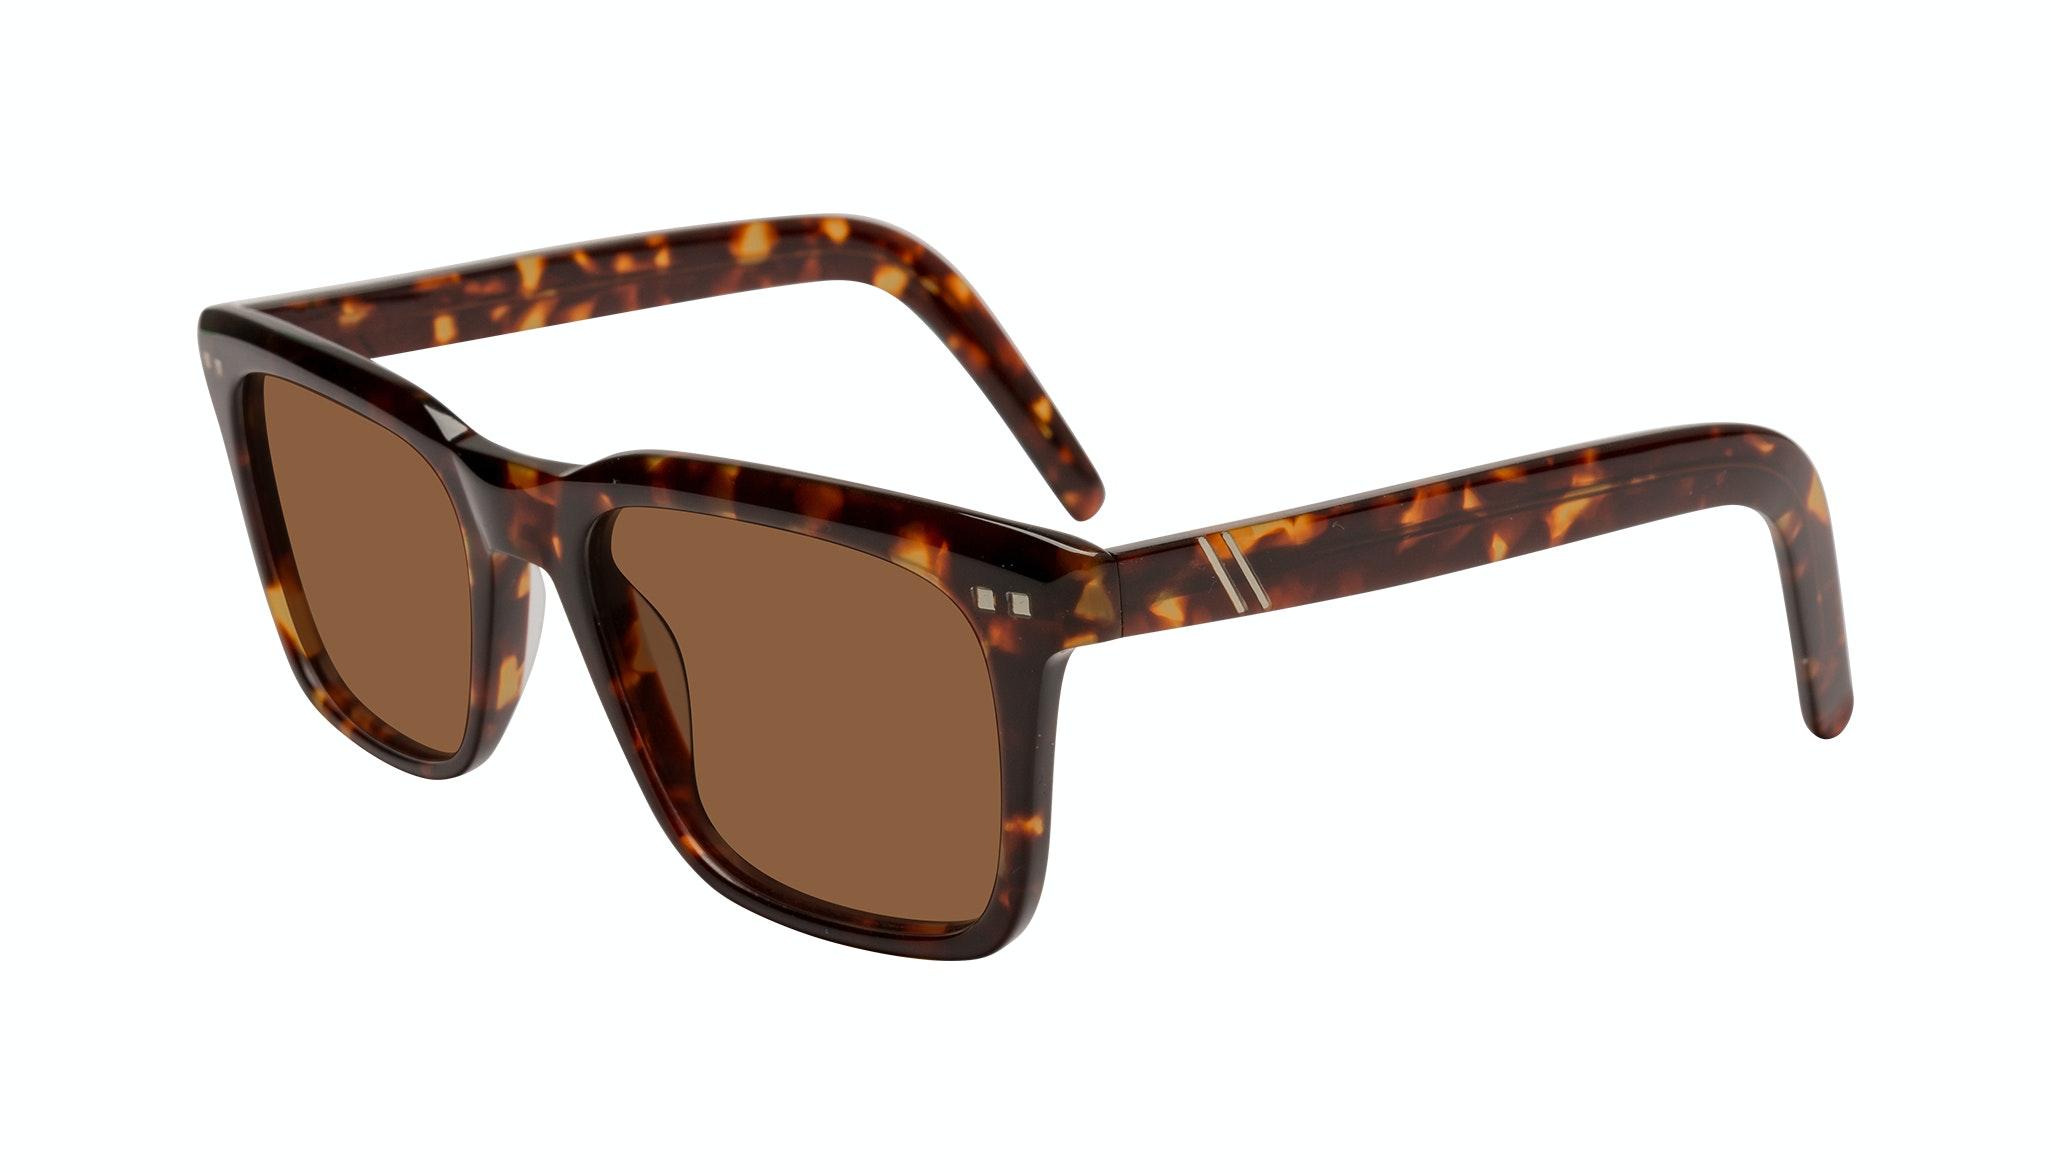 Affordable Fashion Glasses Square Sunglasses Men Well Tortoise Tilt